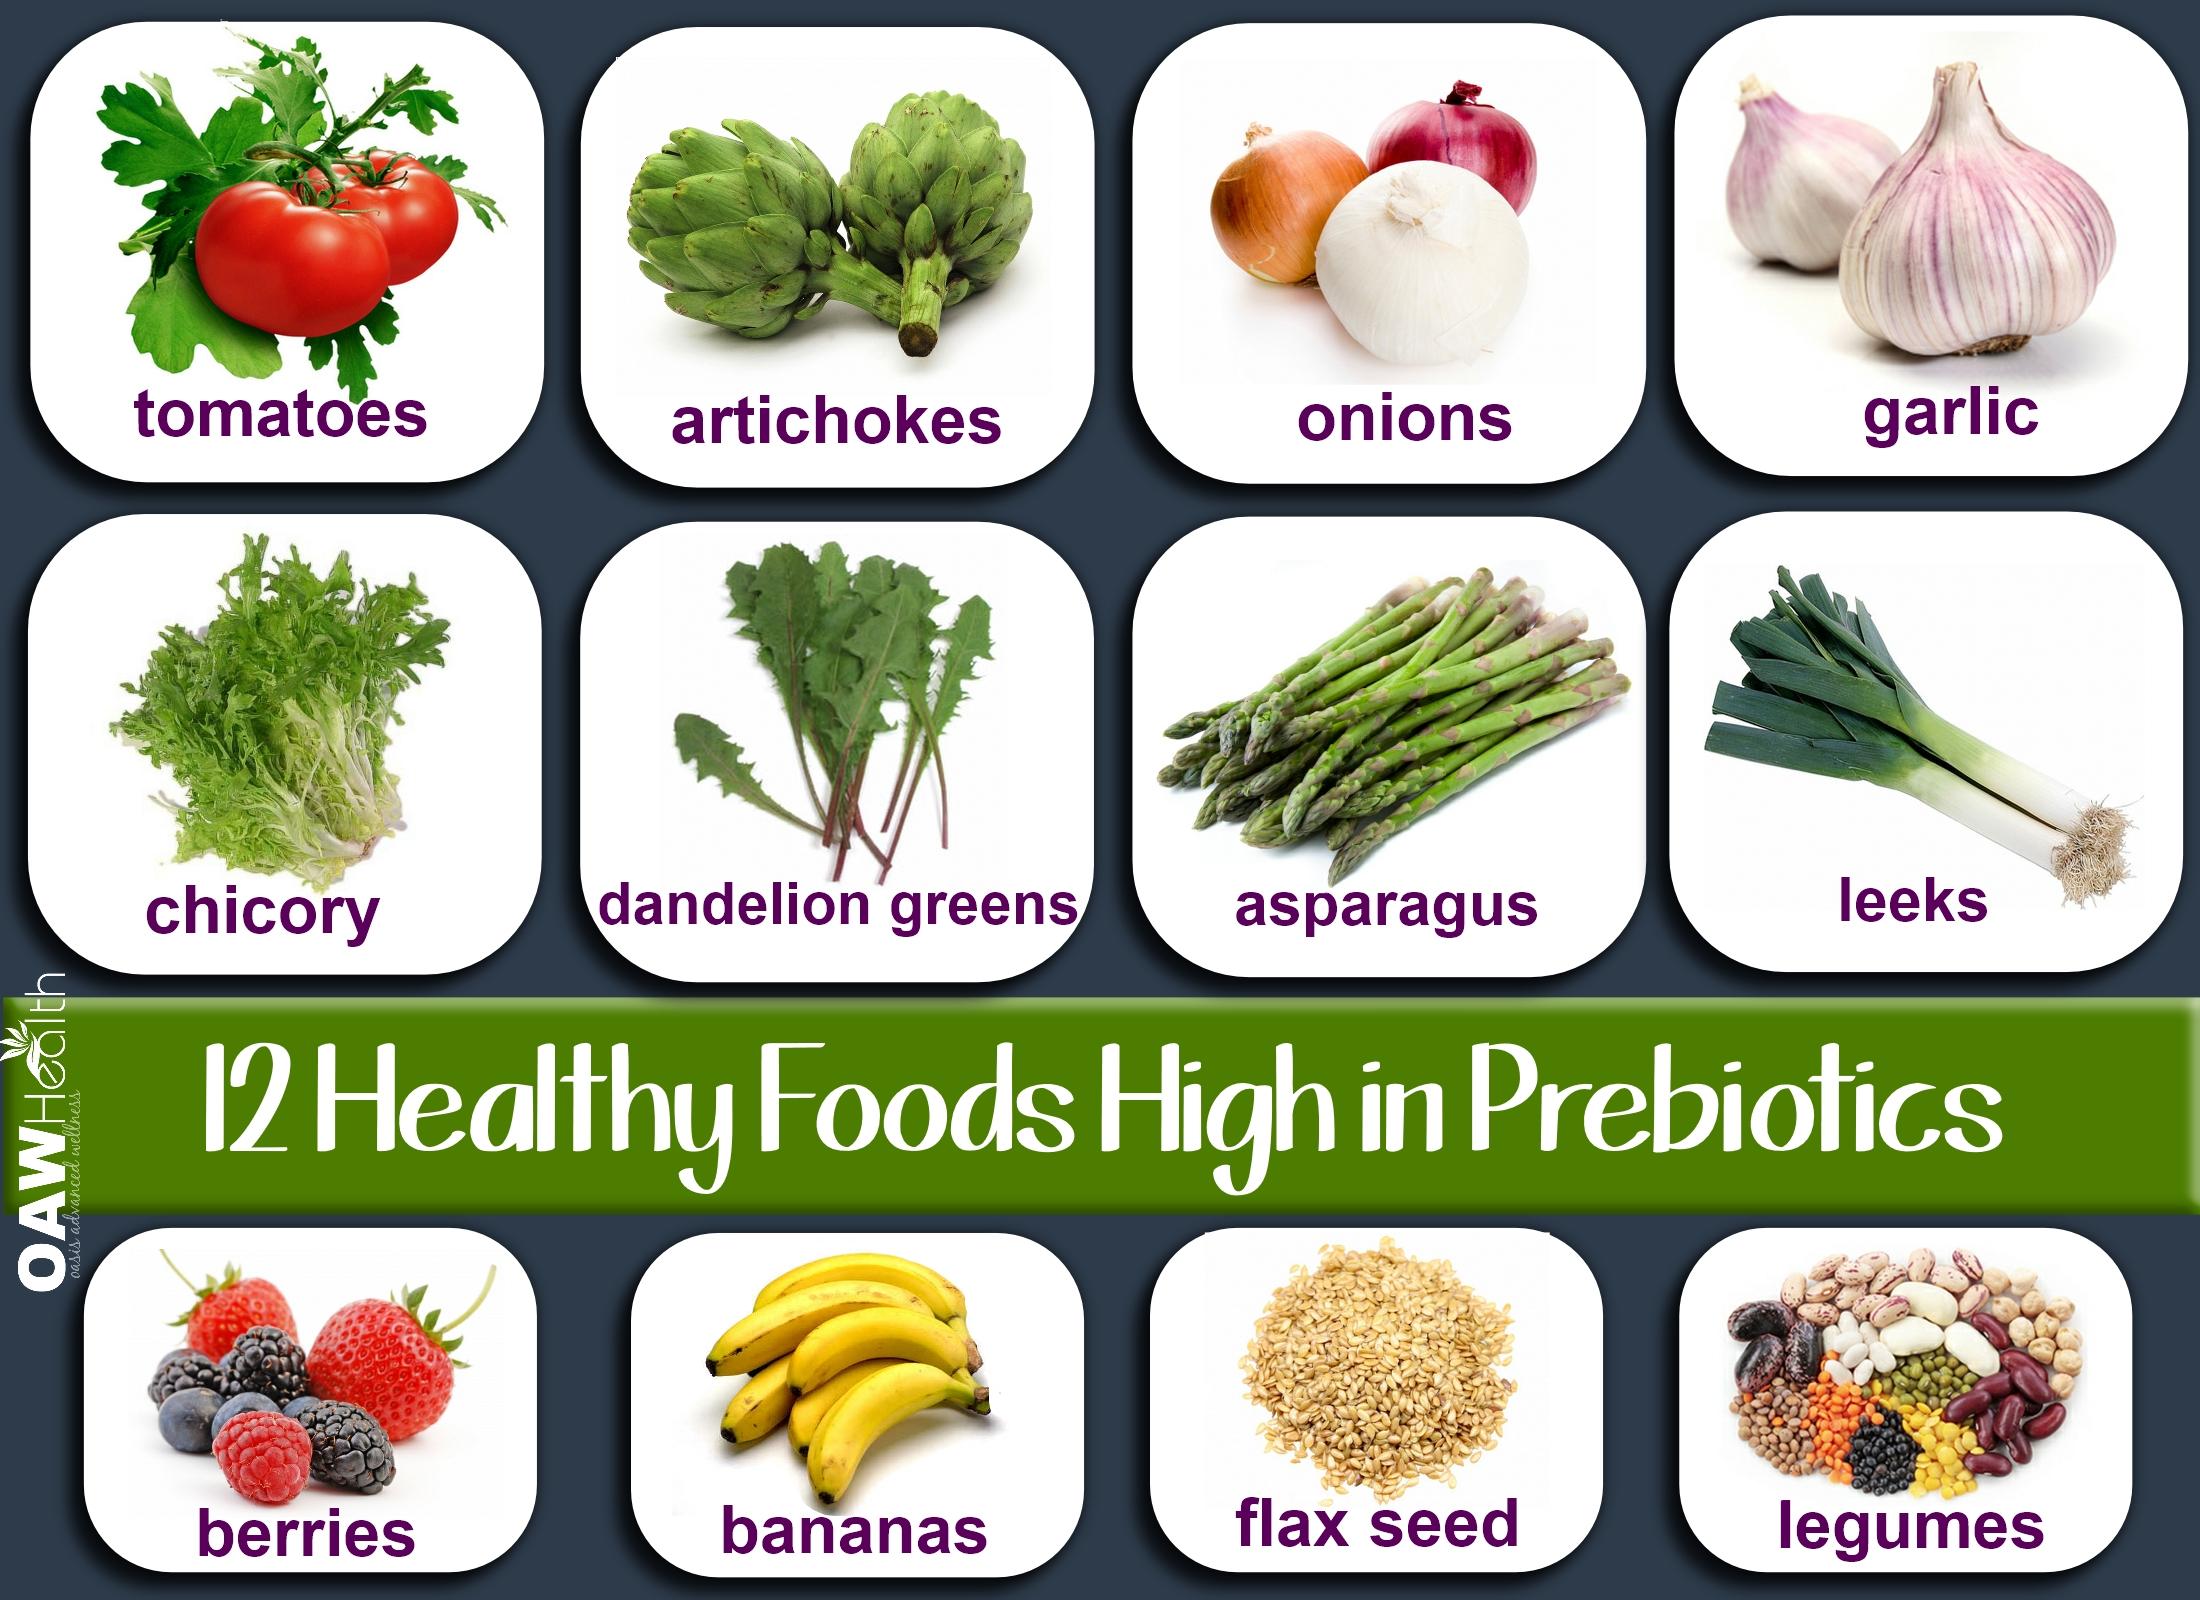 12 Healthy Foods High in Prebiotics